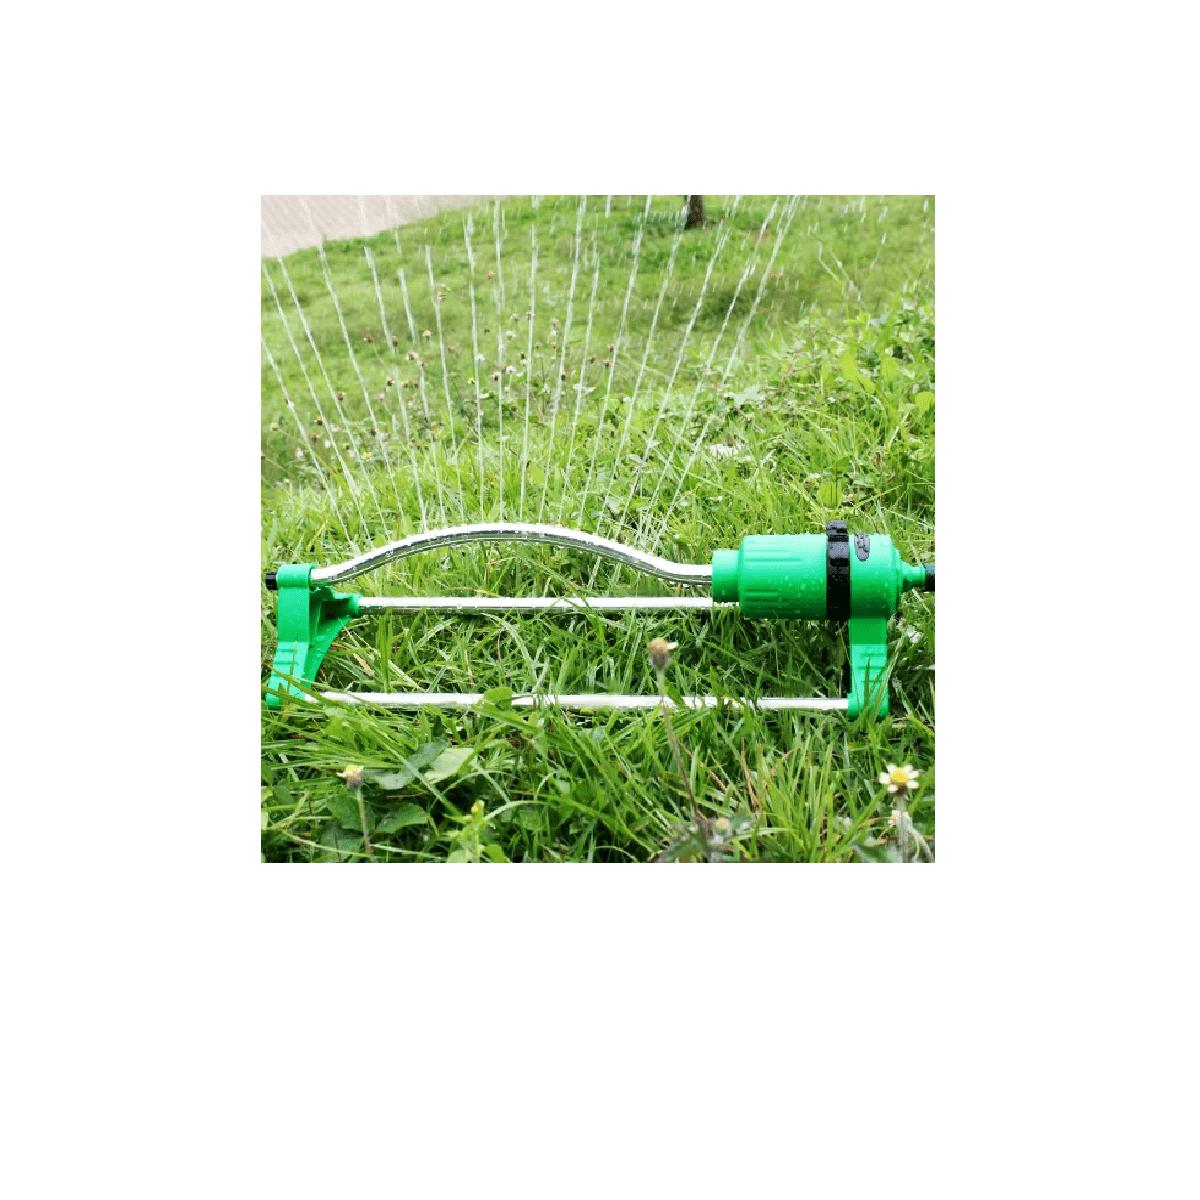 Irrigador Oscilante 17 Furos DY7021 Trapp